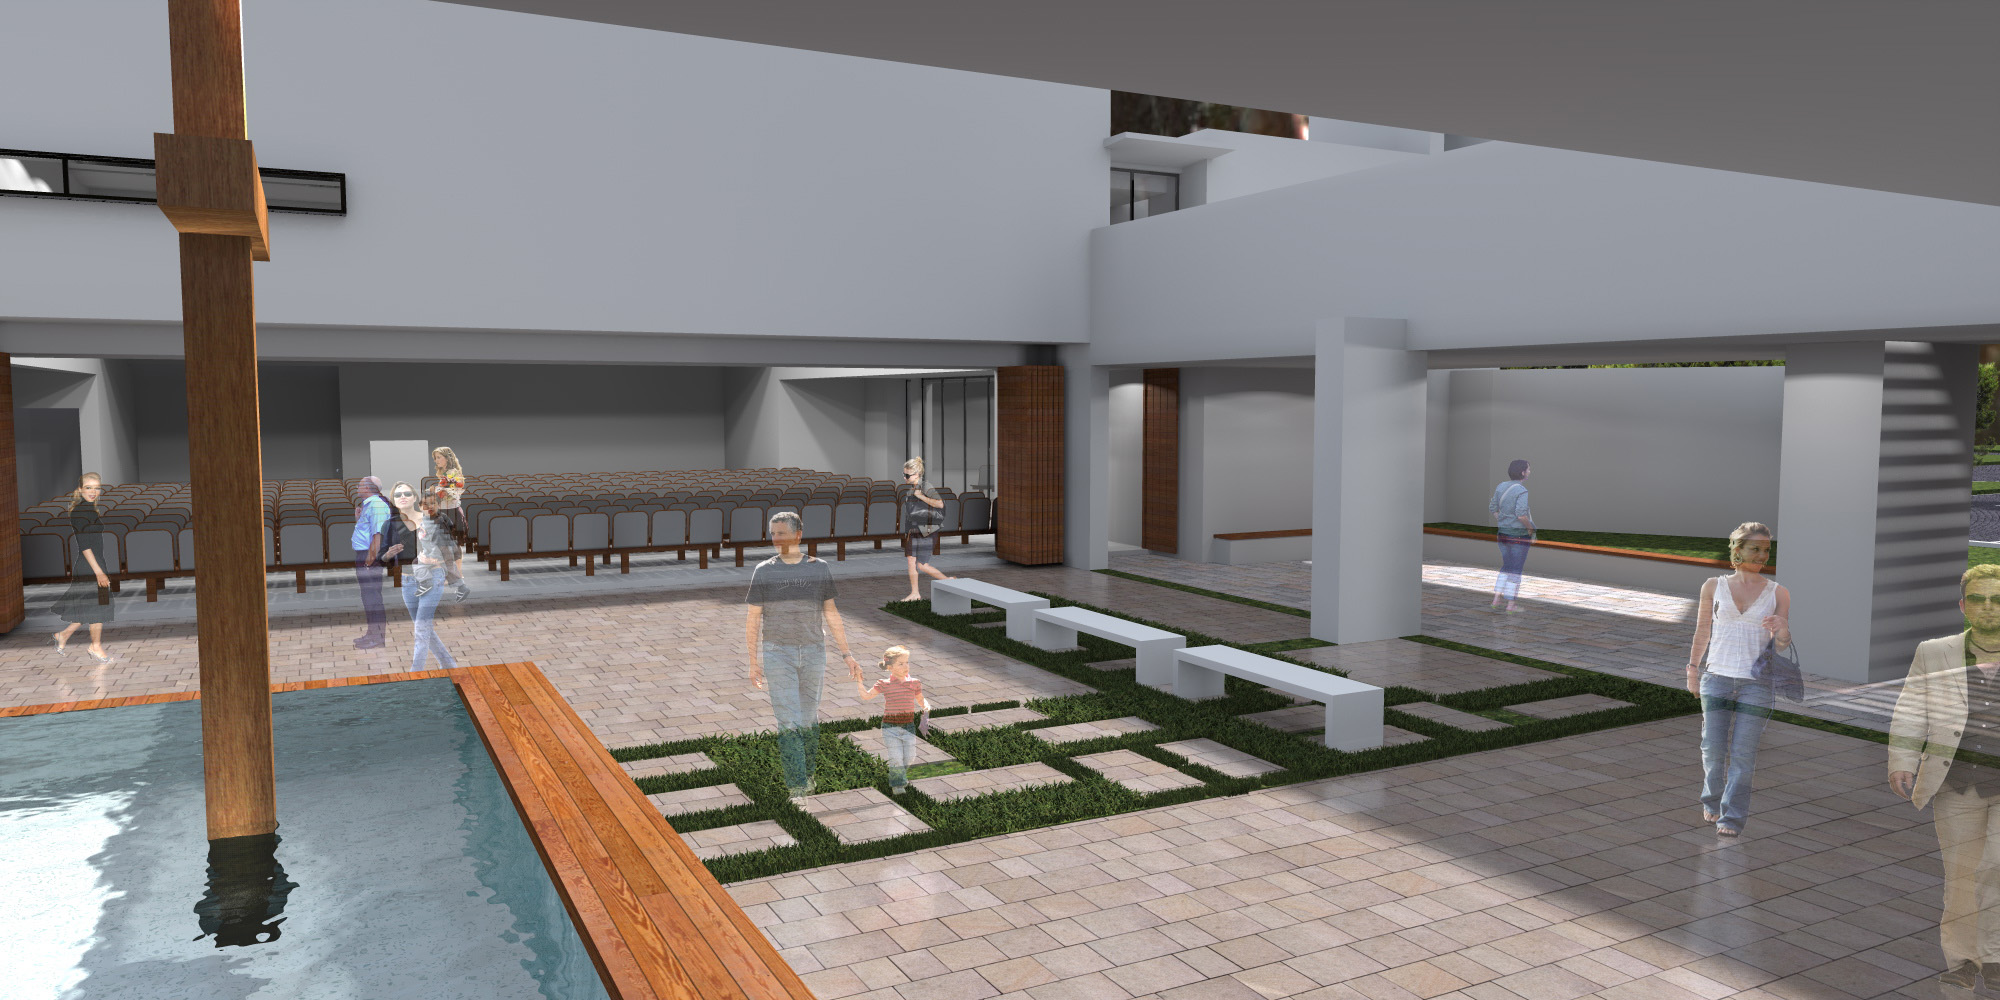 3D Courtyard 1(2).jpg